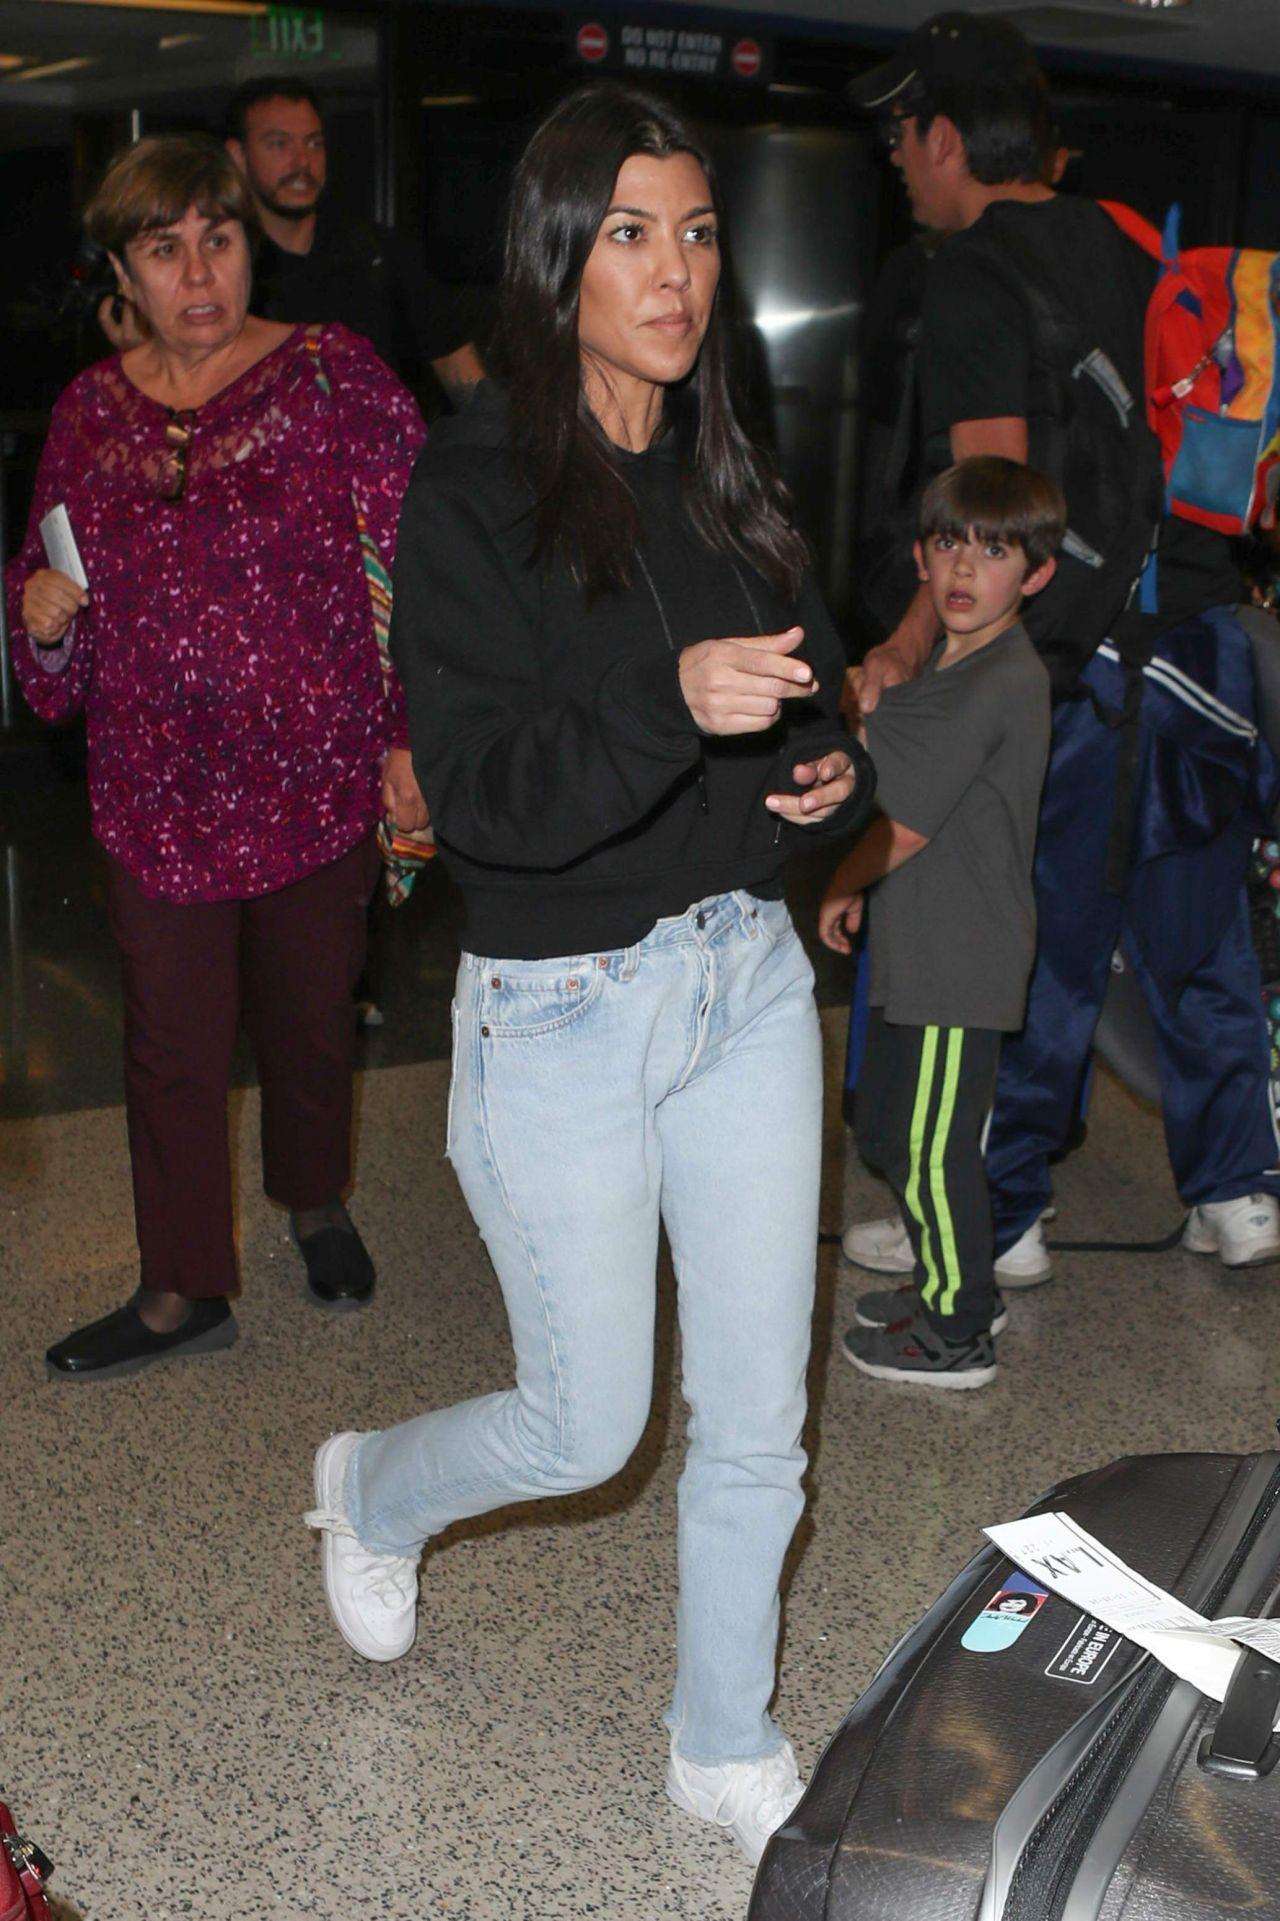 kourtney kardashian at lax airport in la 01232018